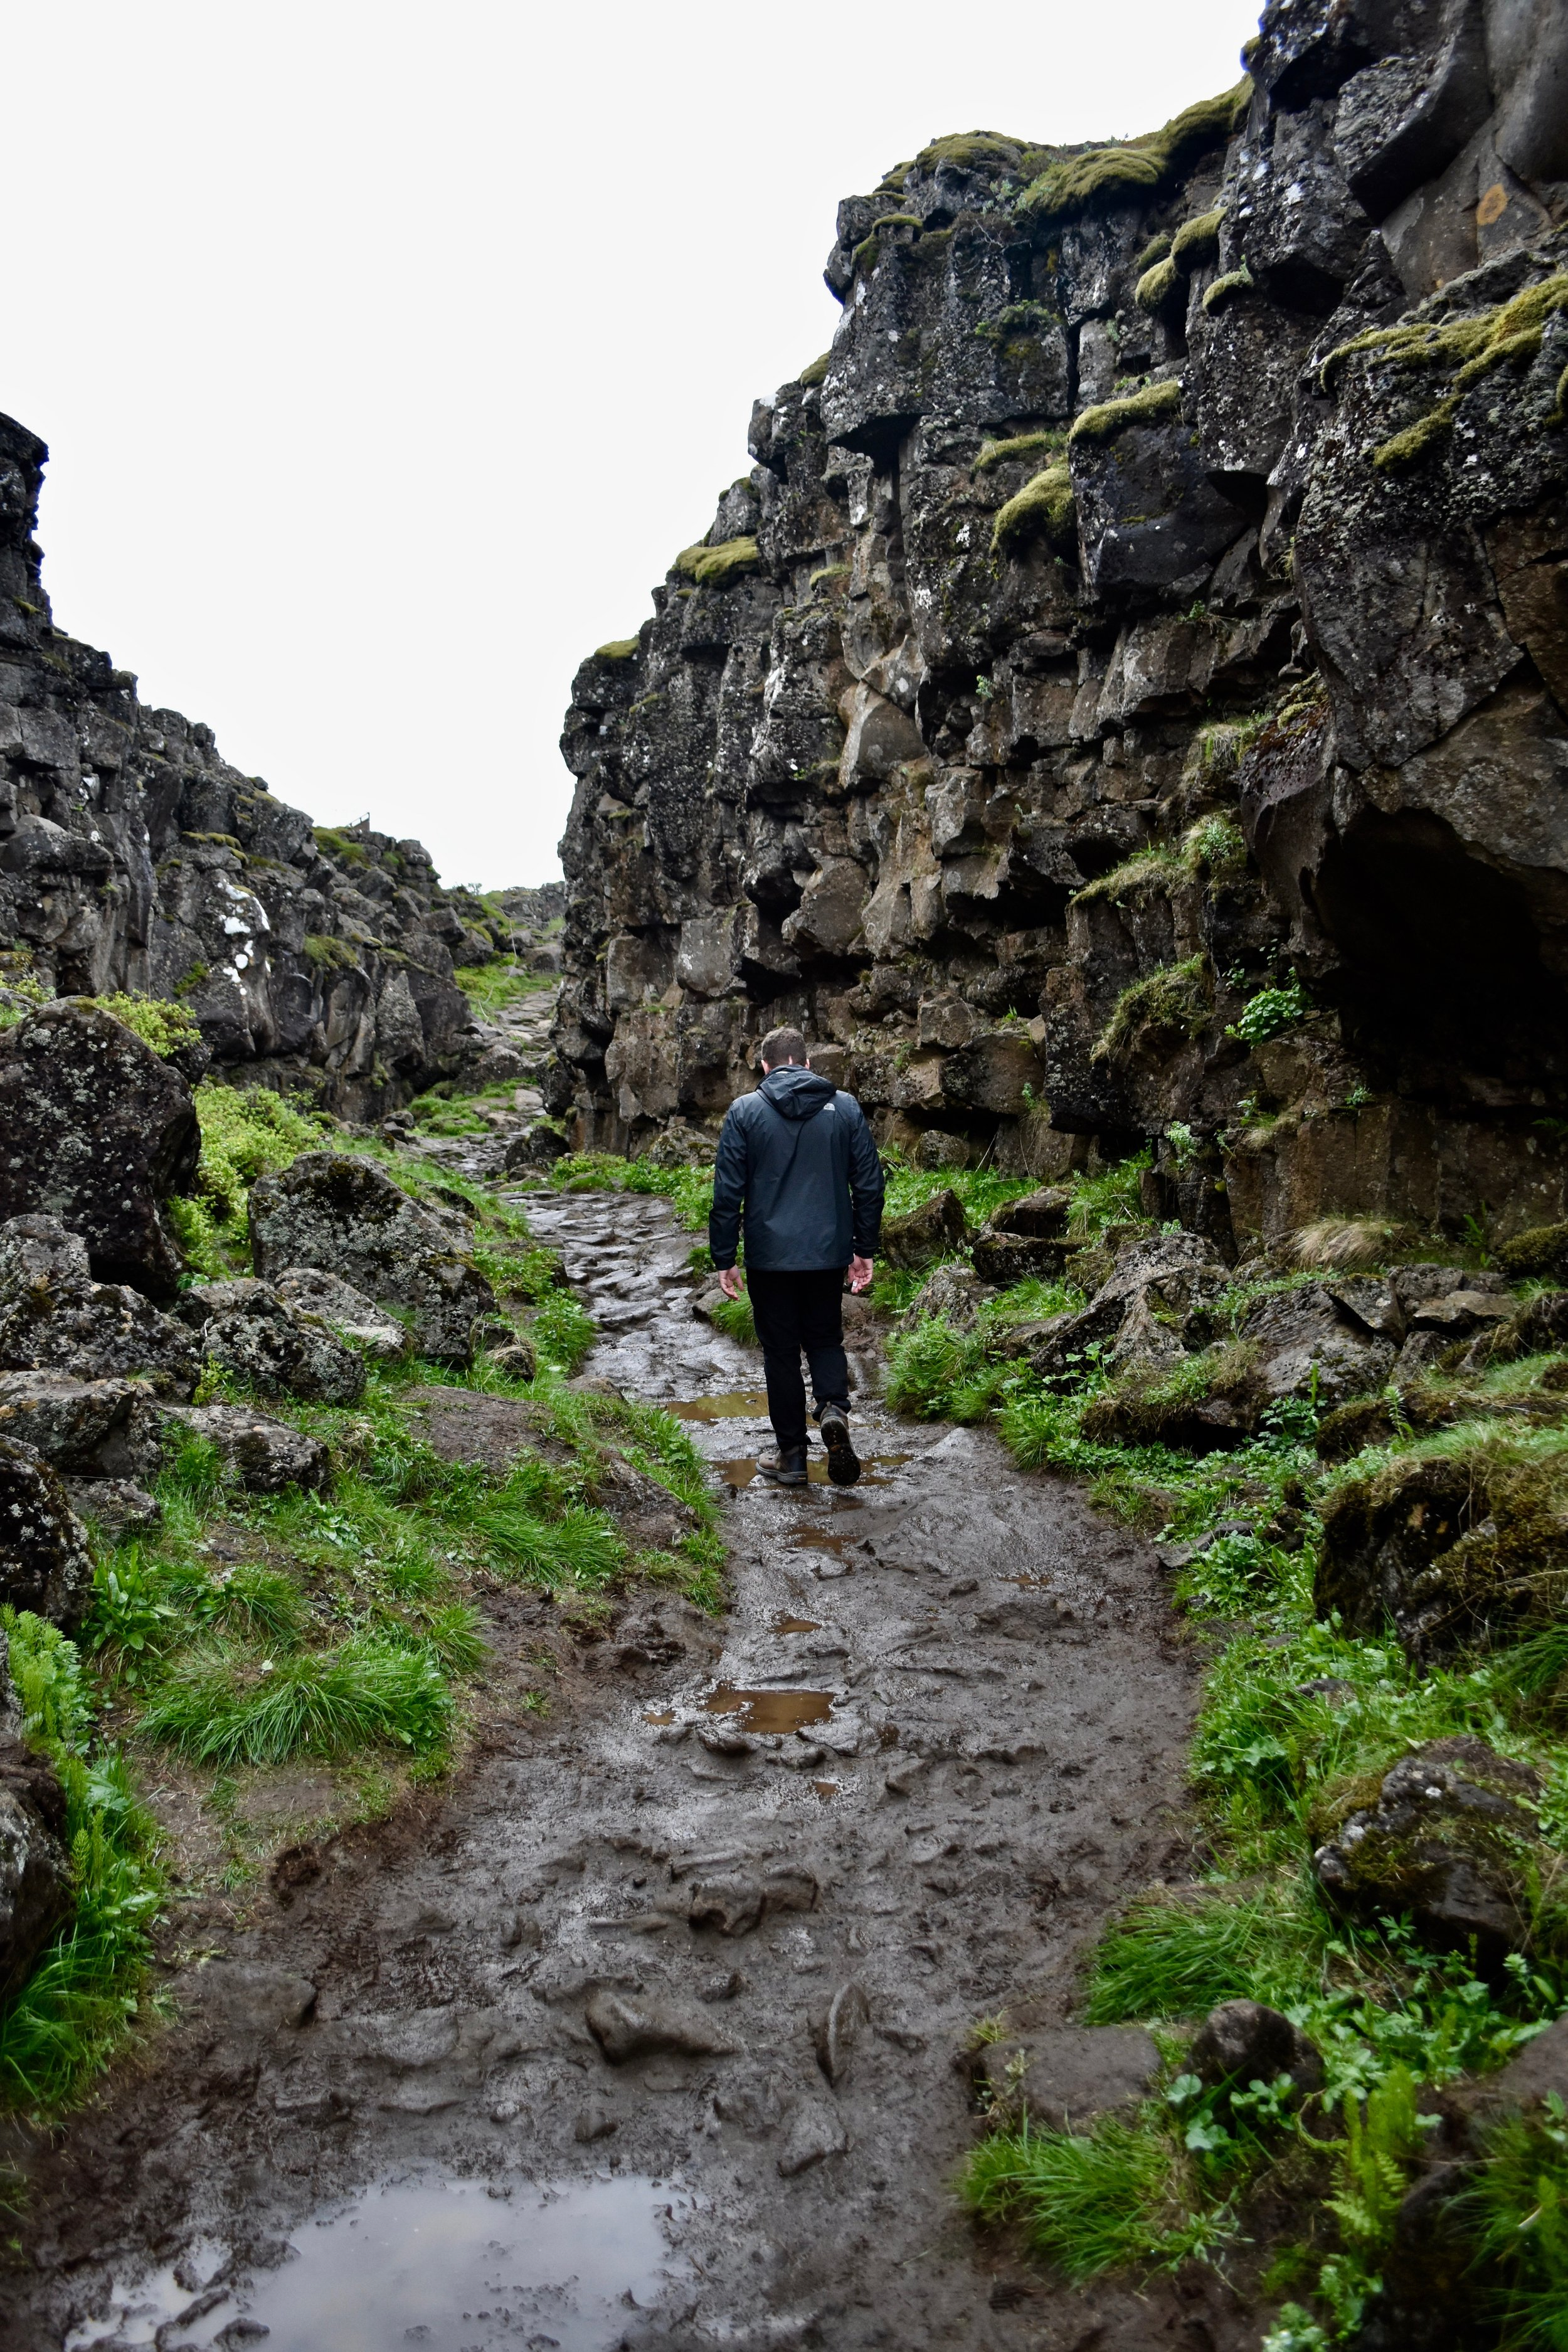 Thingvellir National Park in Golden Circle near Reykjavik, Iceland